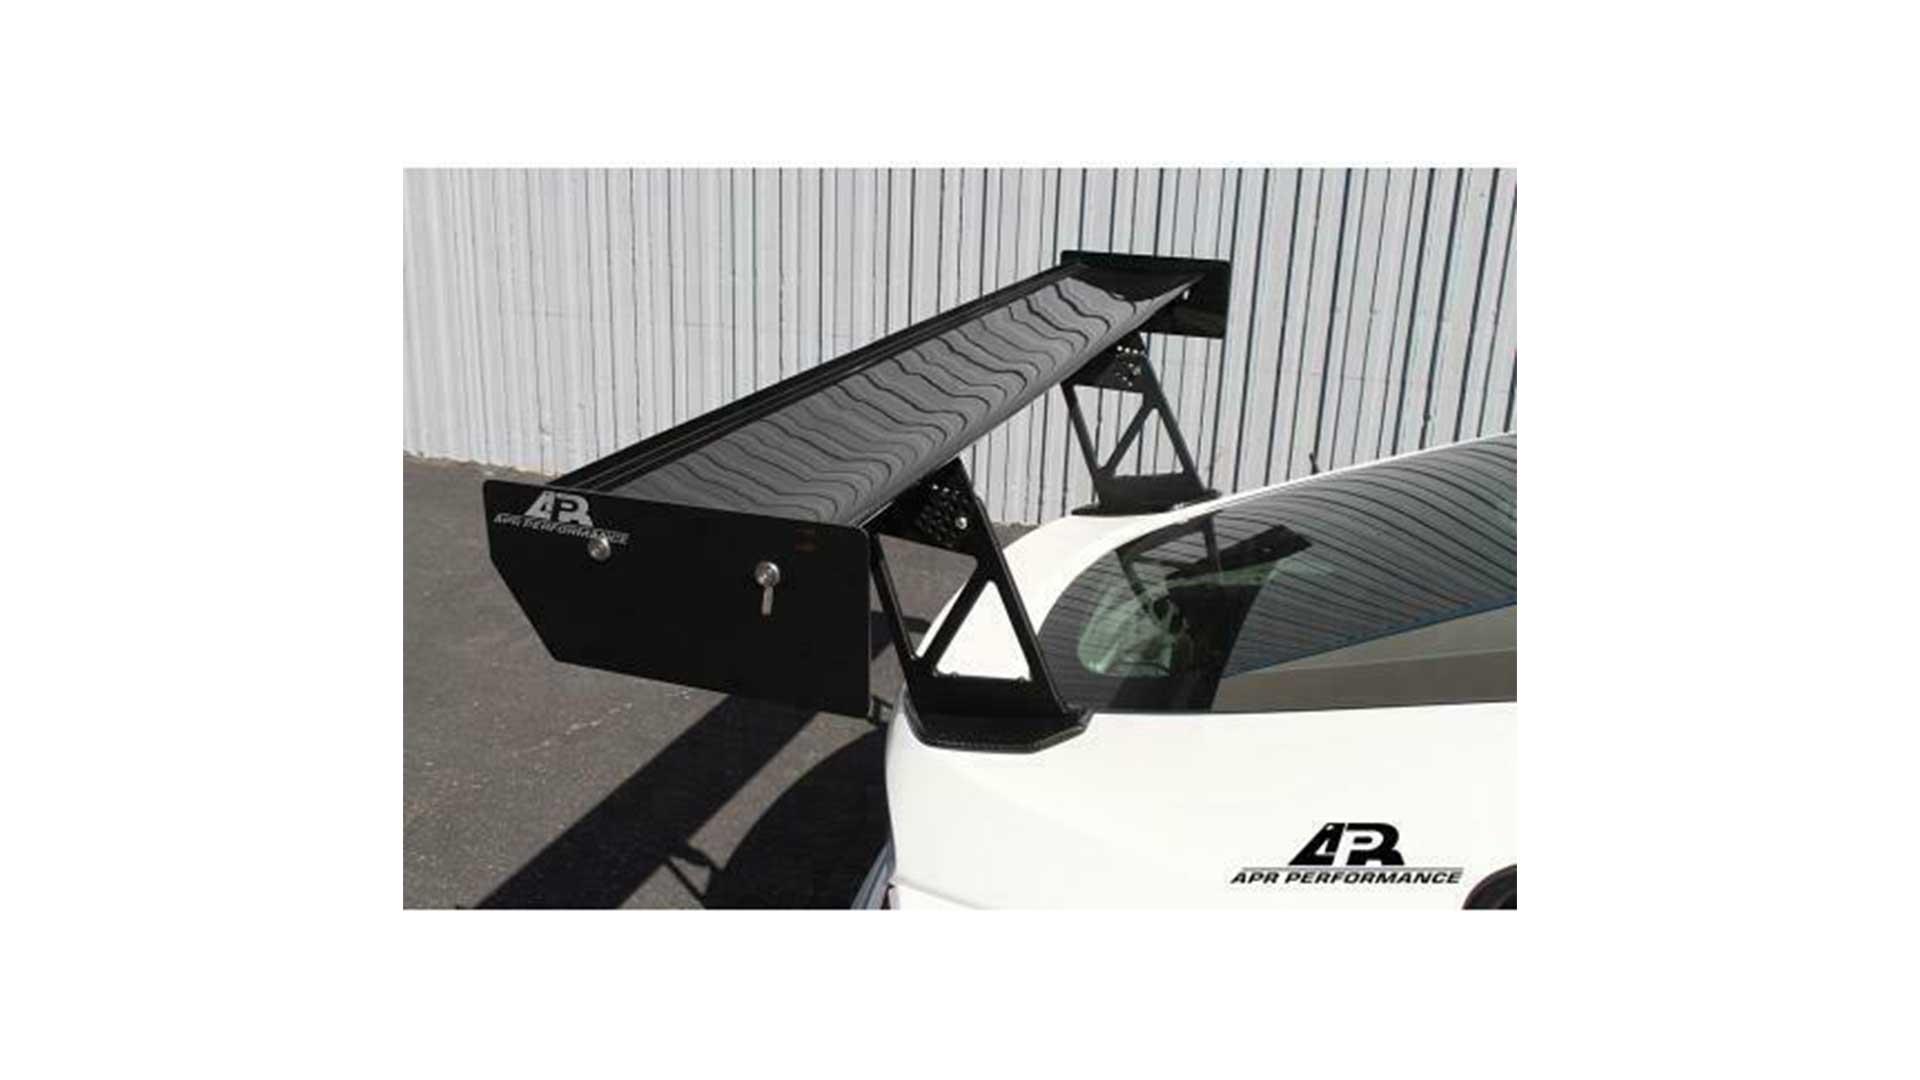 apr bmw z4 e86 carbon fibre gt-250 rear spoiler as-206141